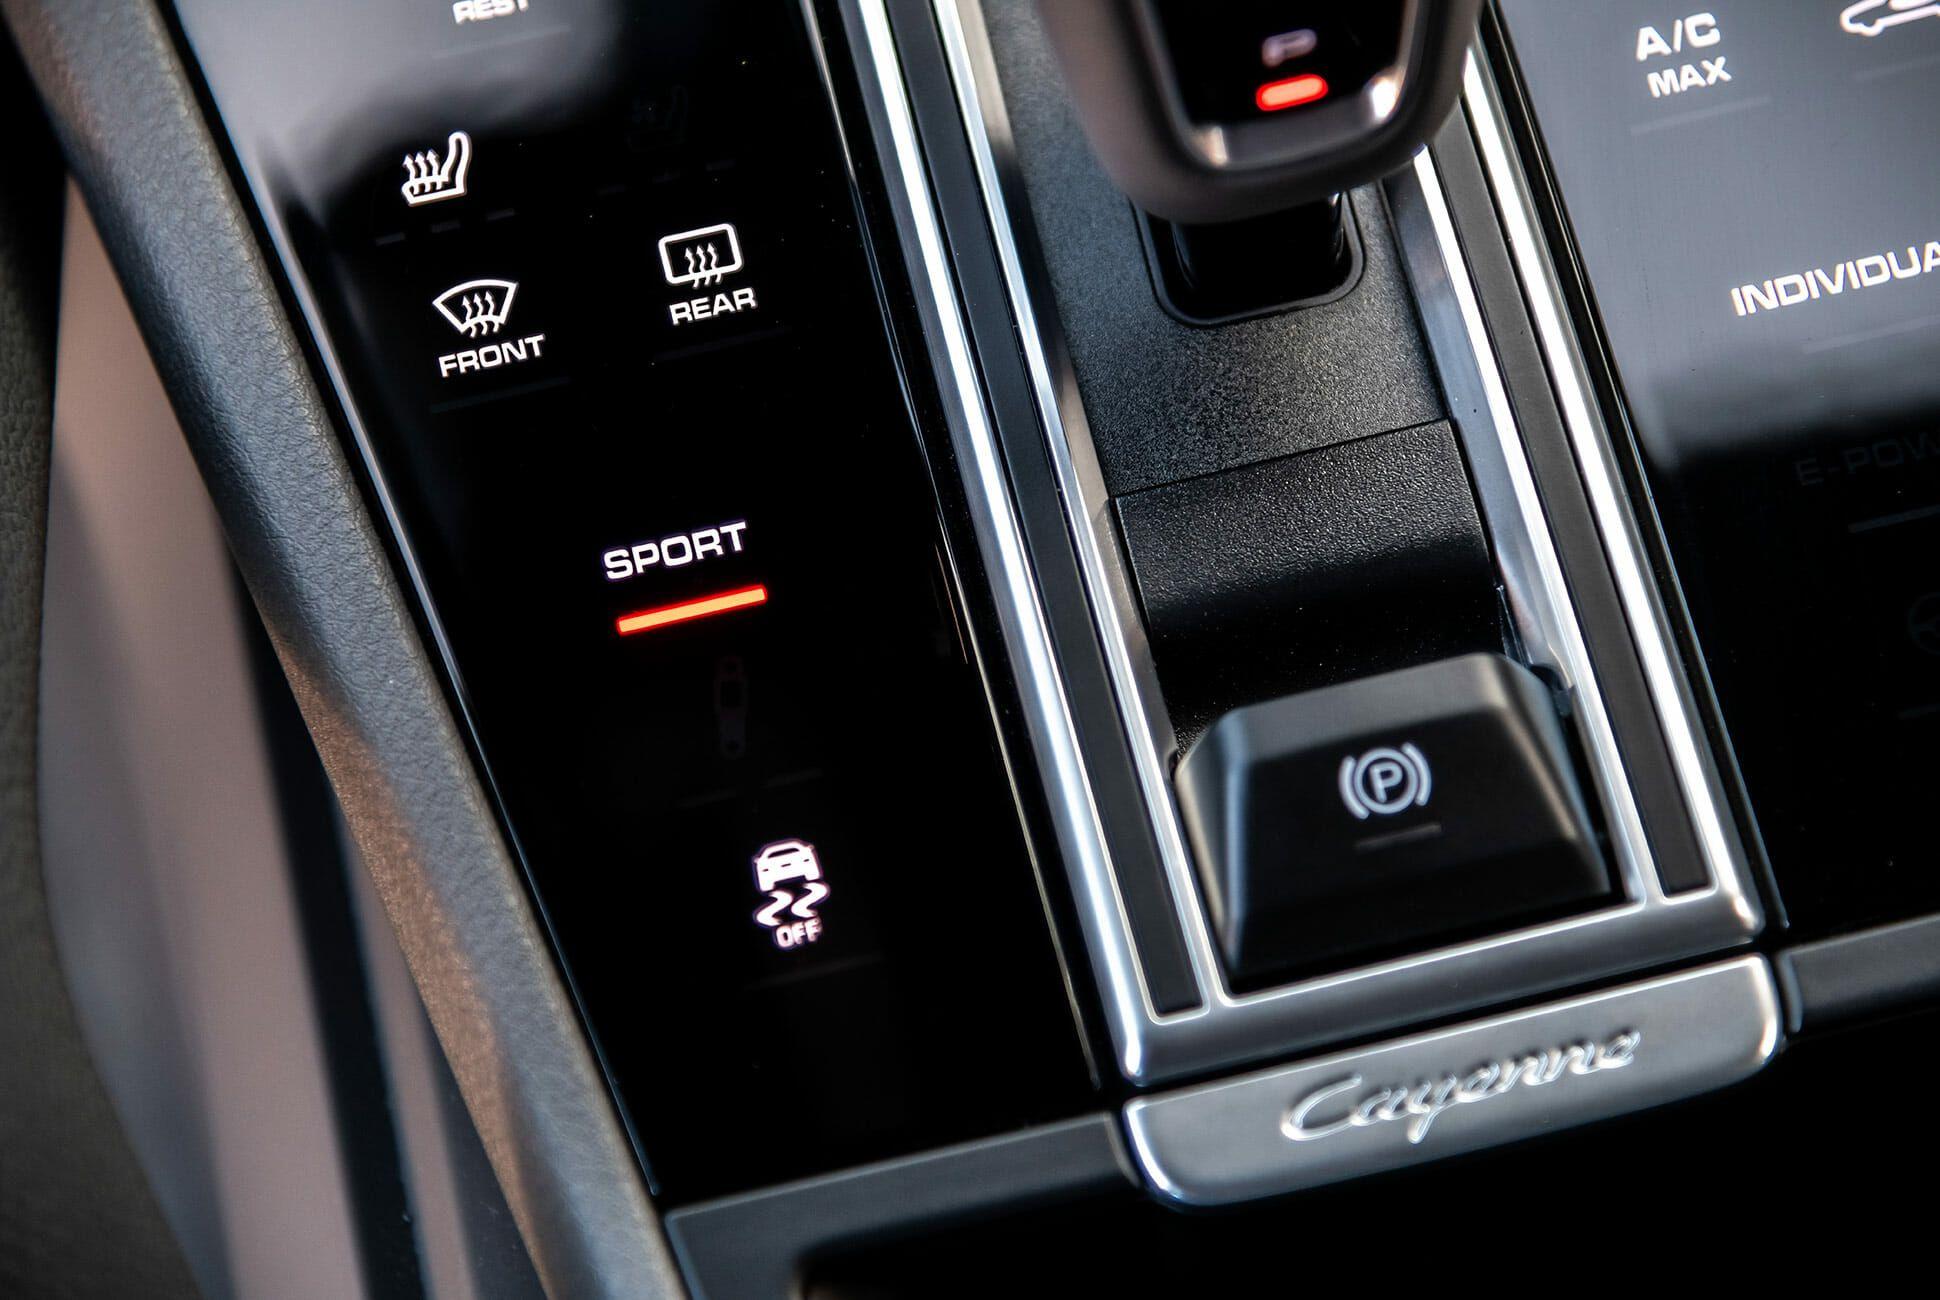 Porsche-Cayenne-Review-gear-patrol-slide-6